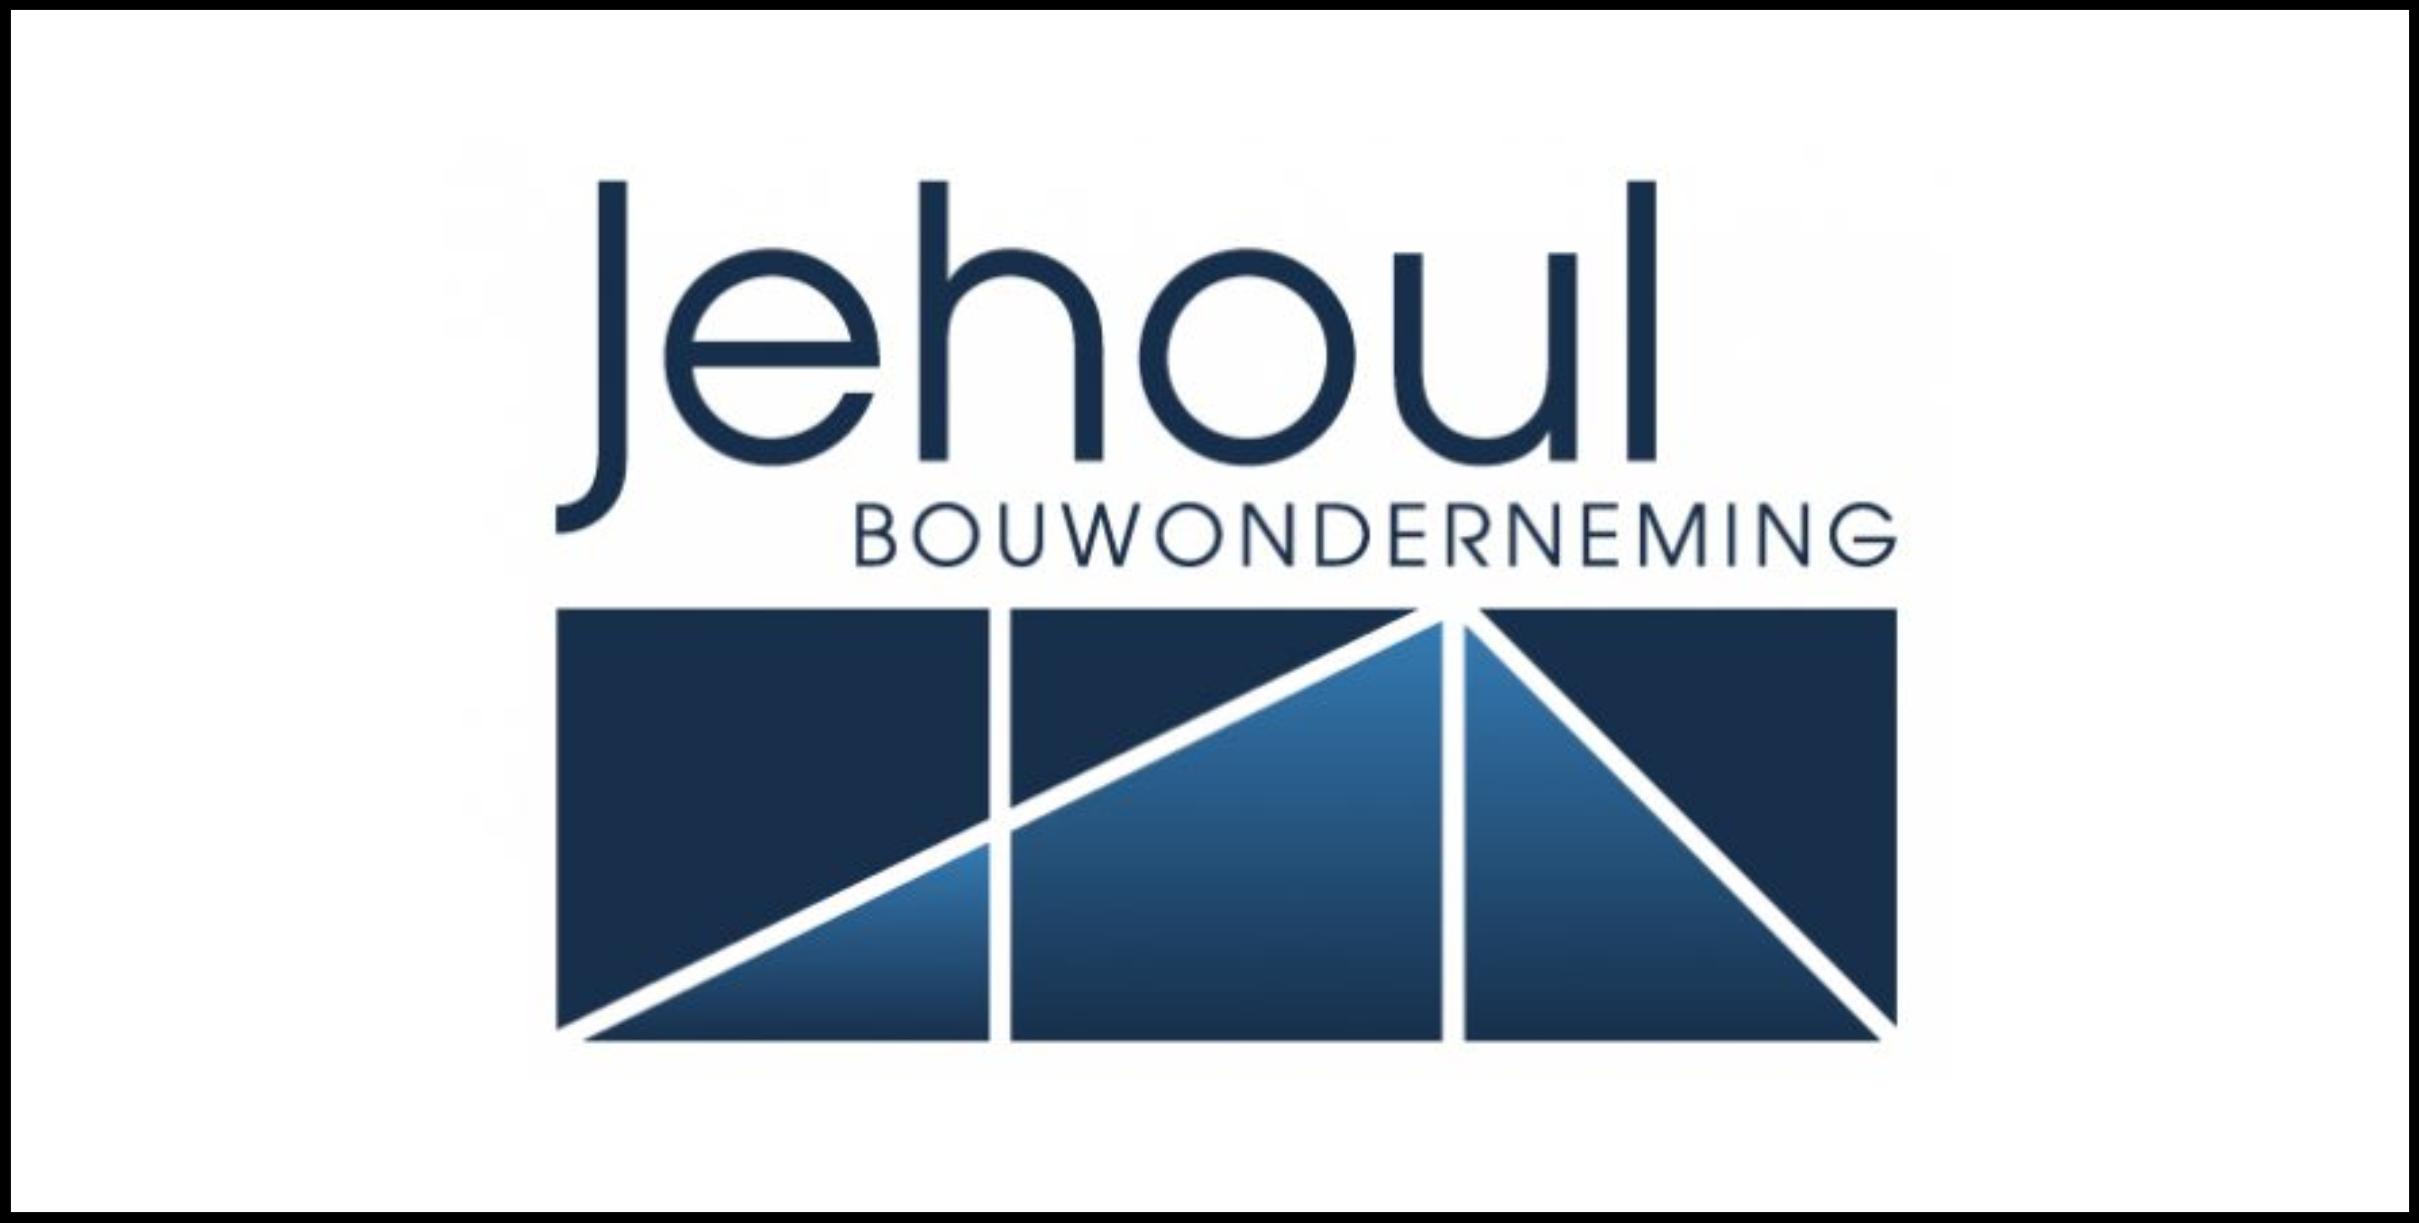 Jehoul Bouwonderneming